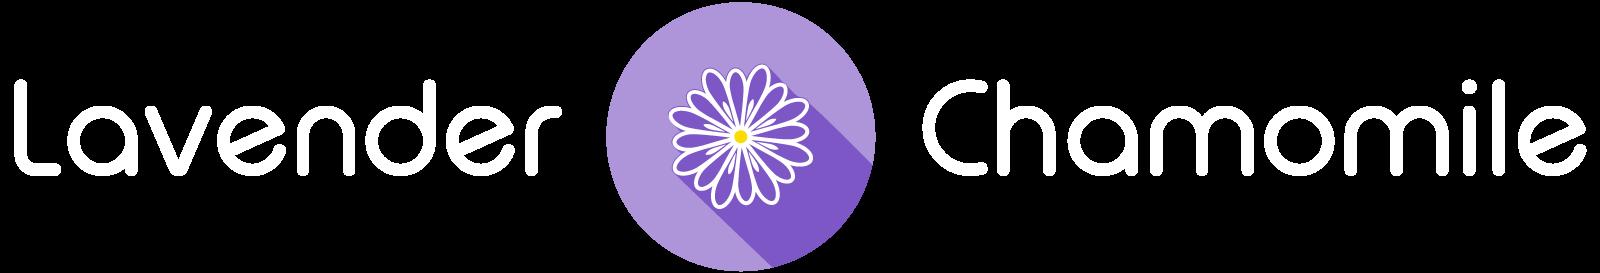 Lavender and Chamomile logo